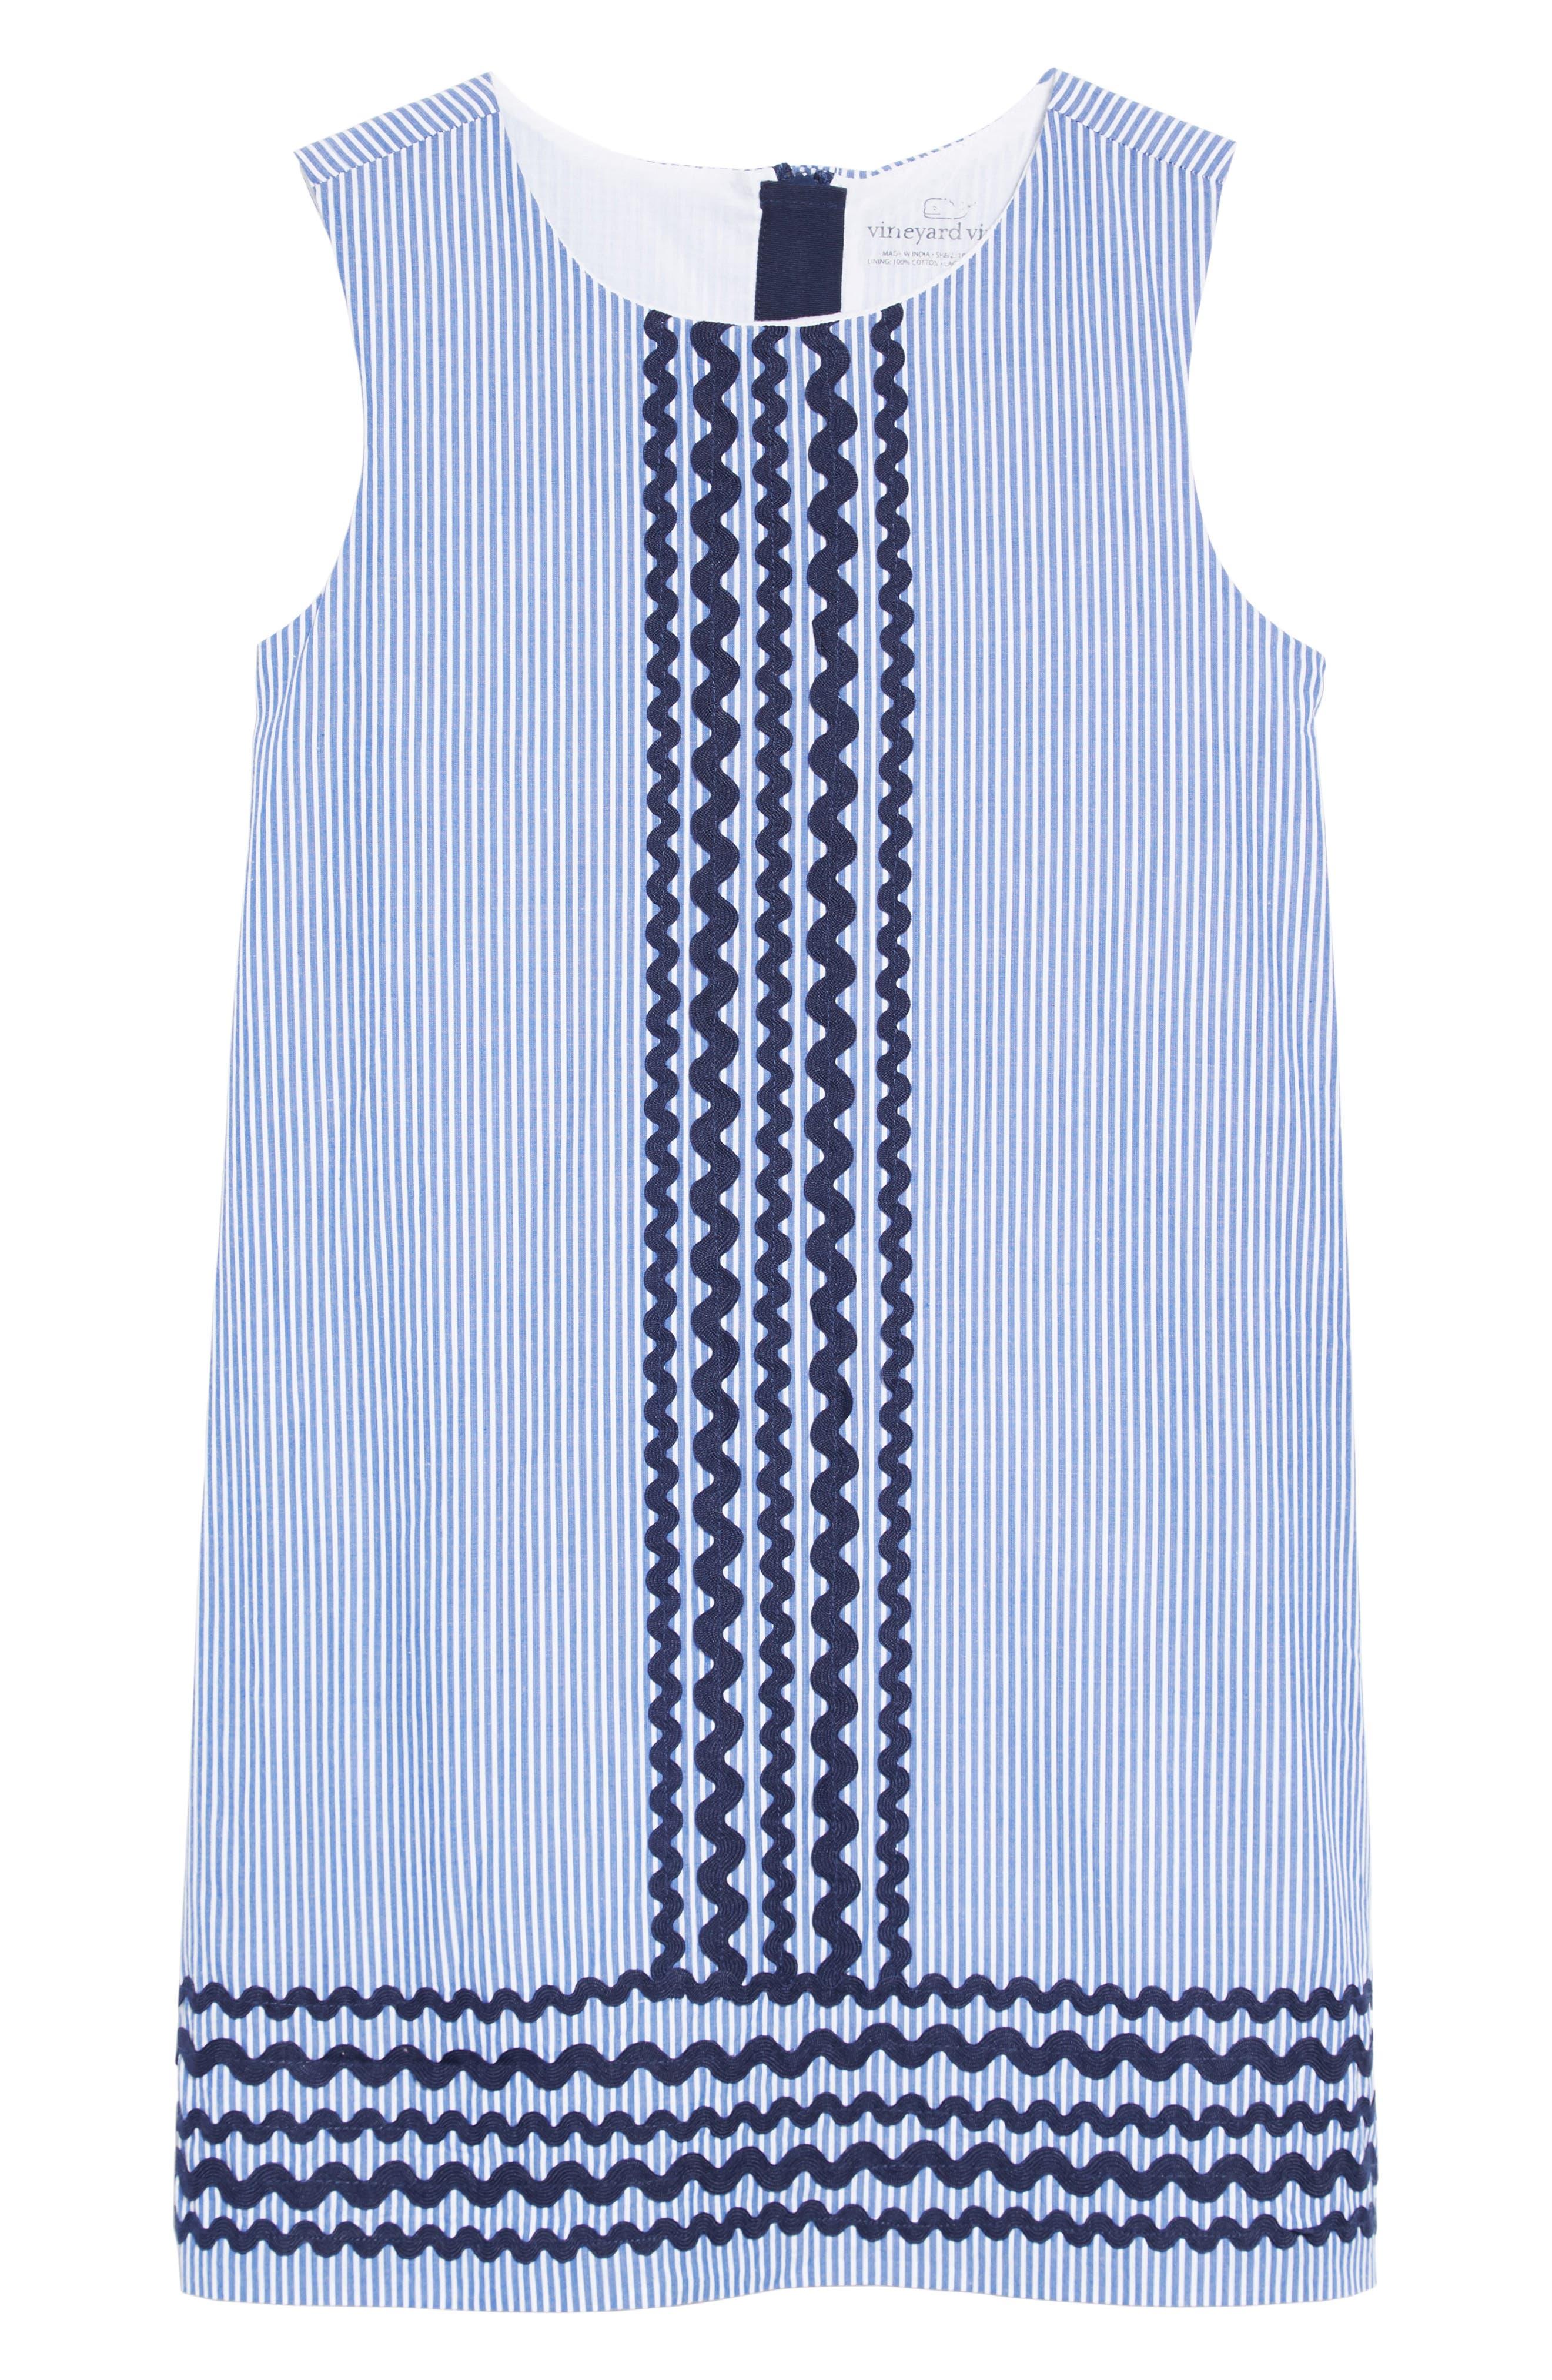 Ric Rac Stripe Shift Dress,                             Main thumbnail 1, color,                             DEEP BAY